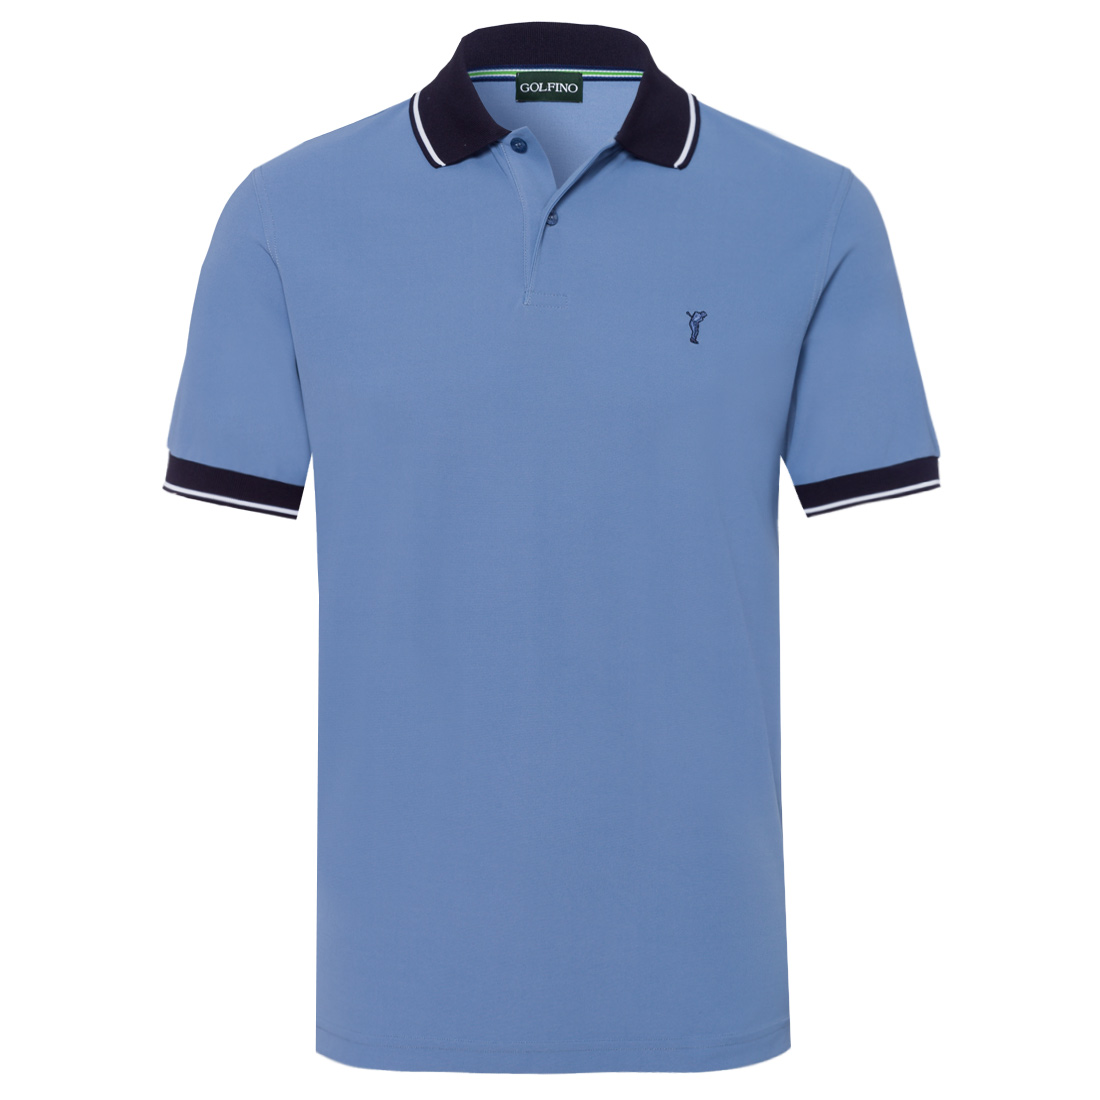 Extra Dry Kurzarm Poloshirt